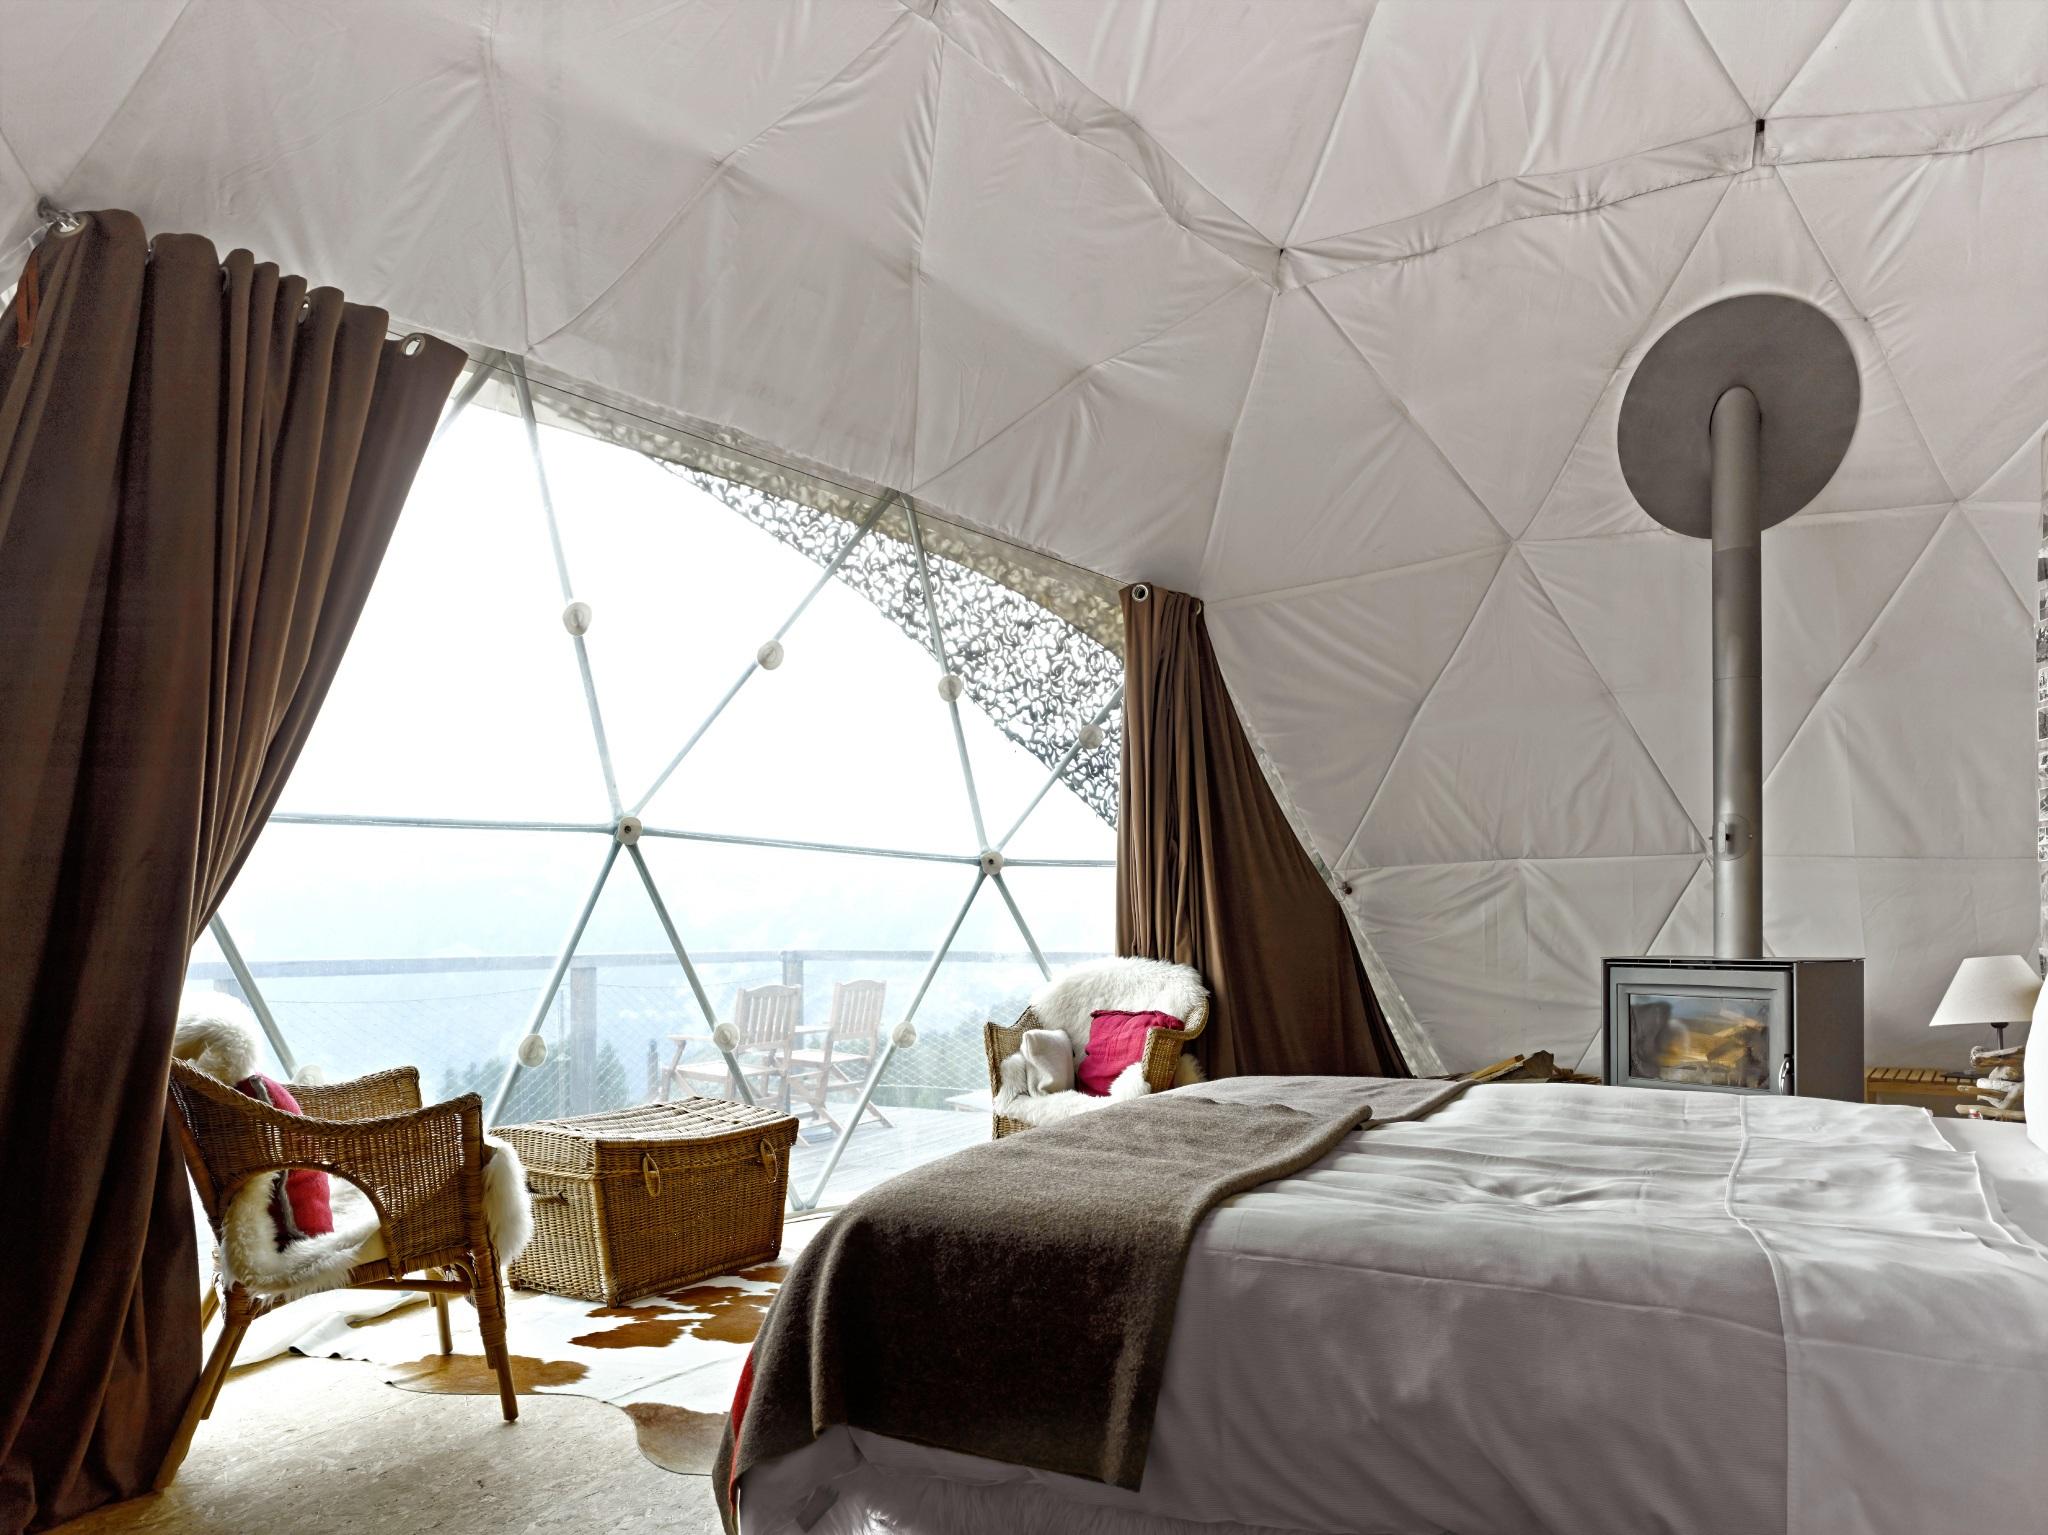 Whitepod hotel suisse